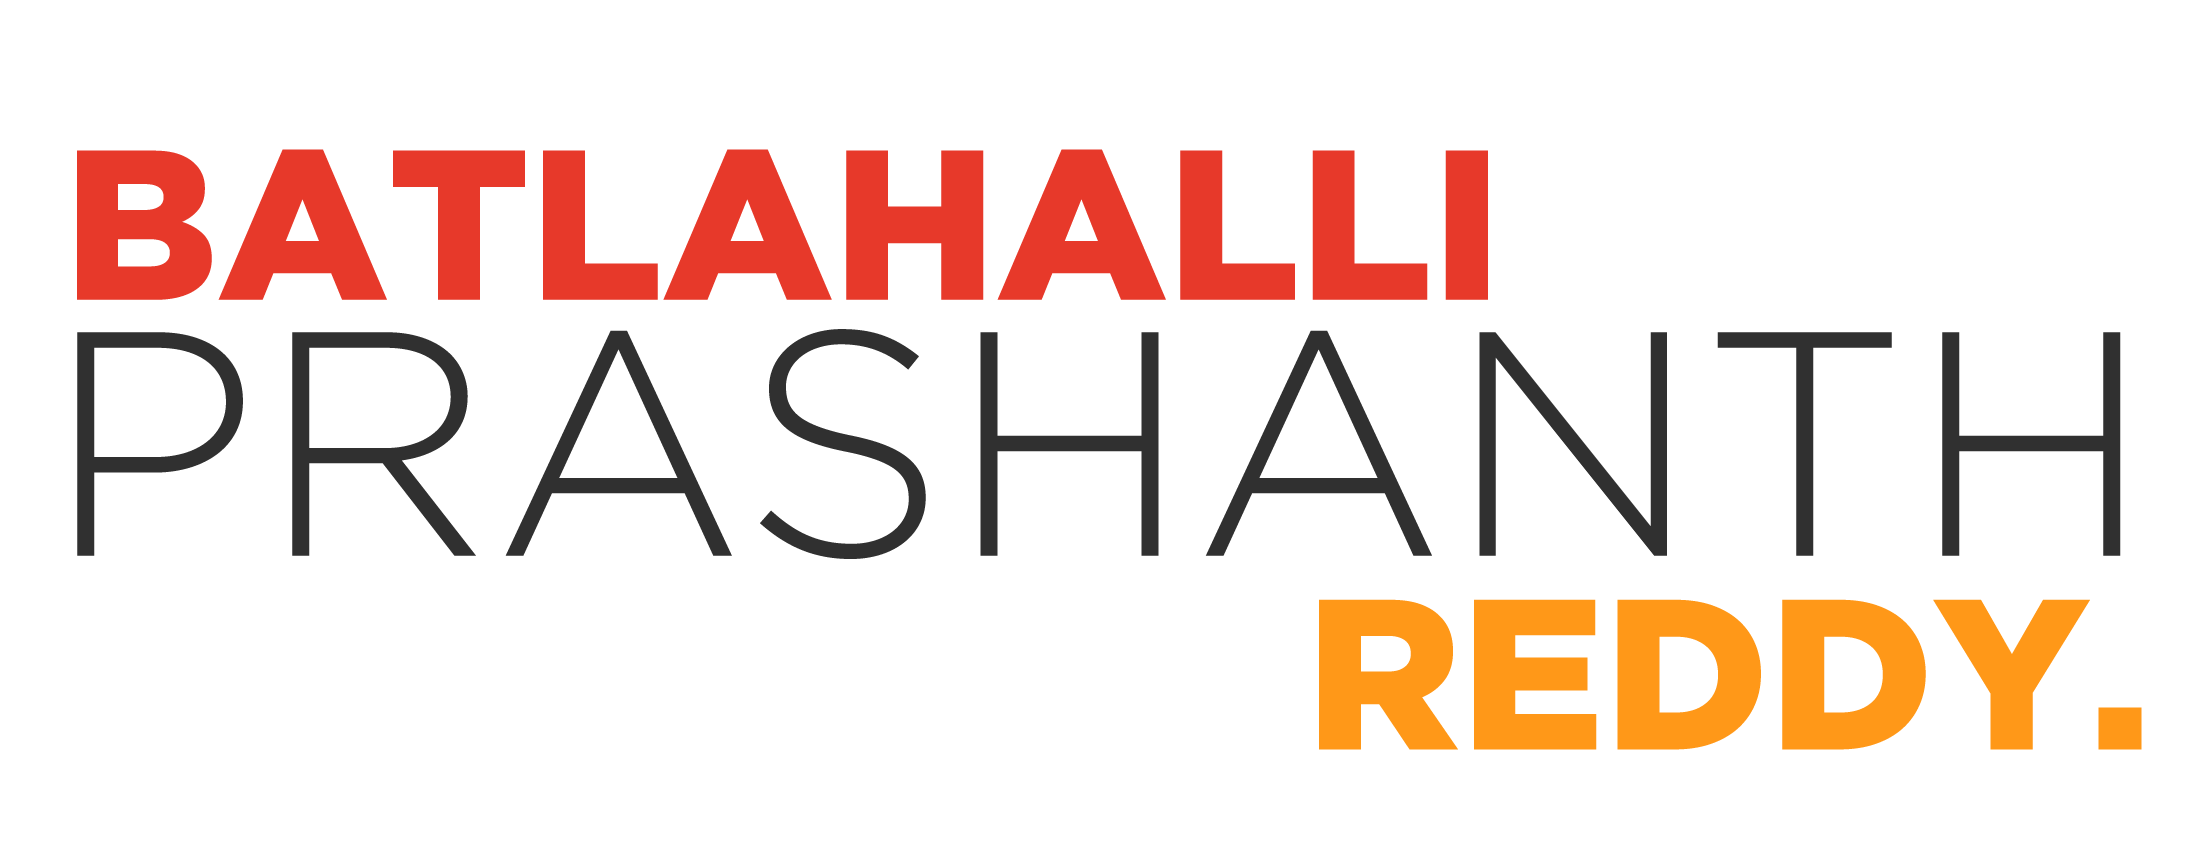 Batlahalli Prashanth Reddy